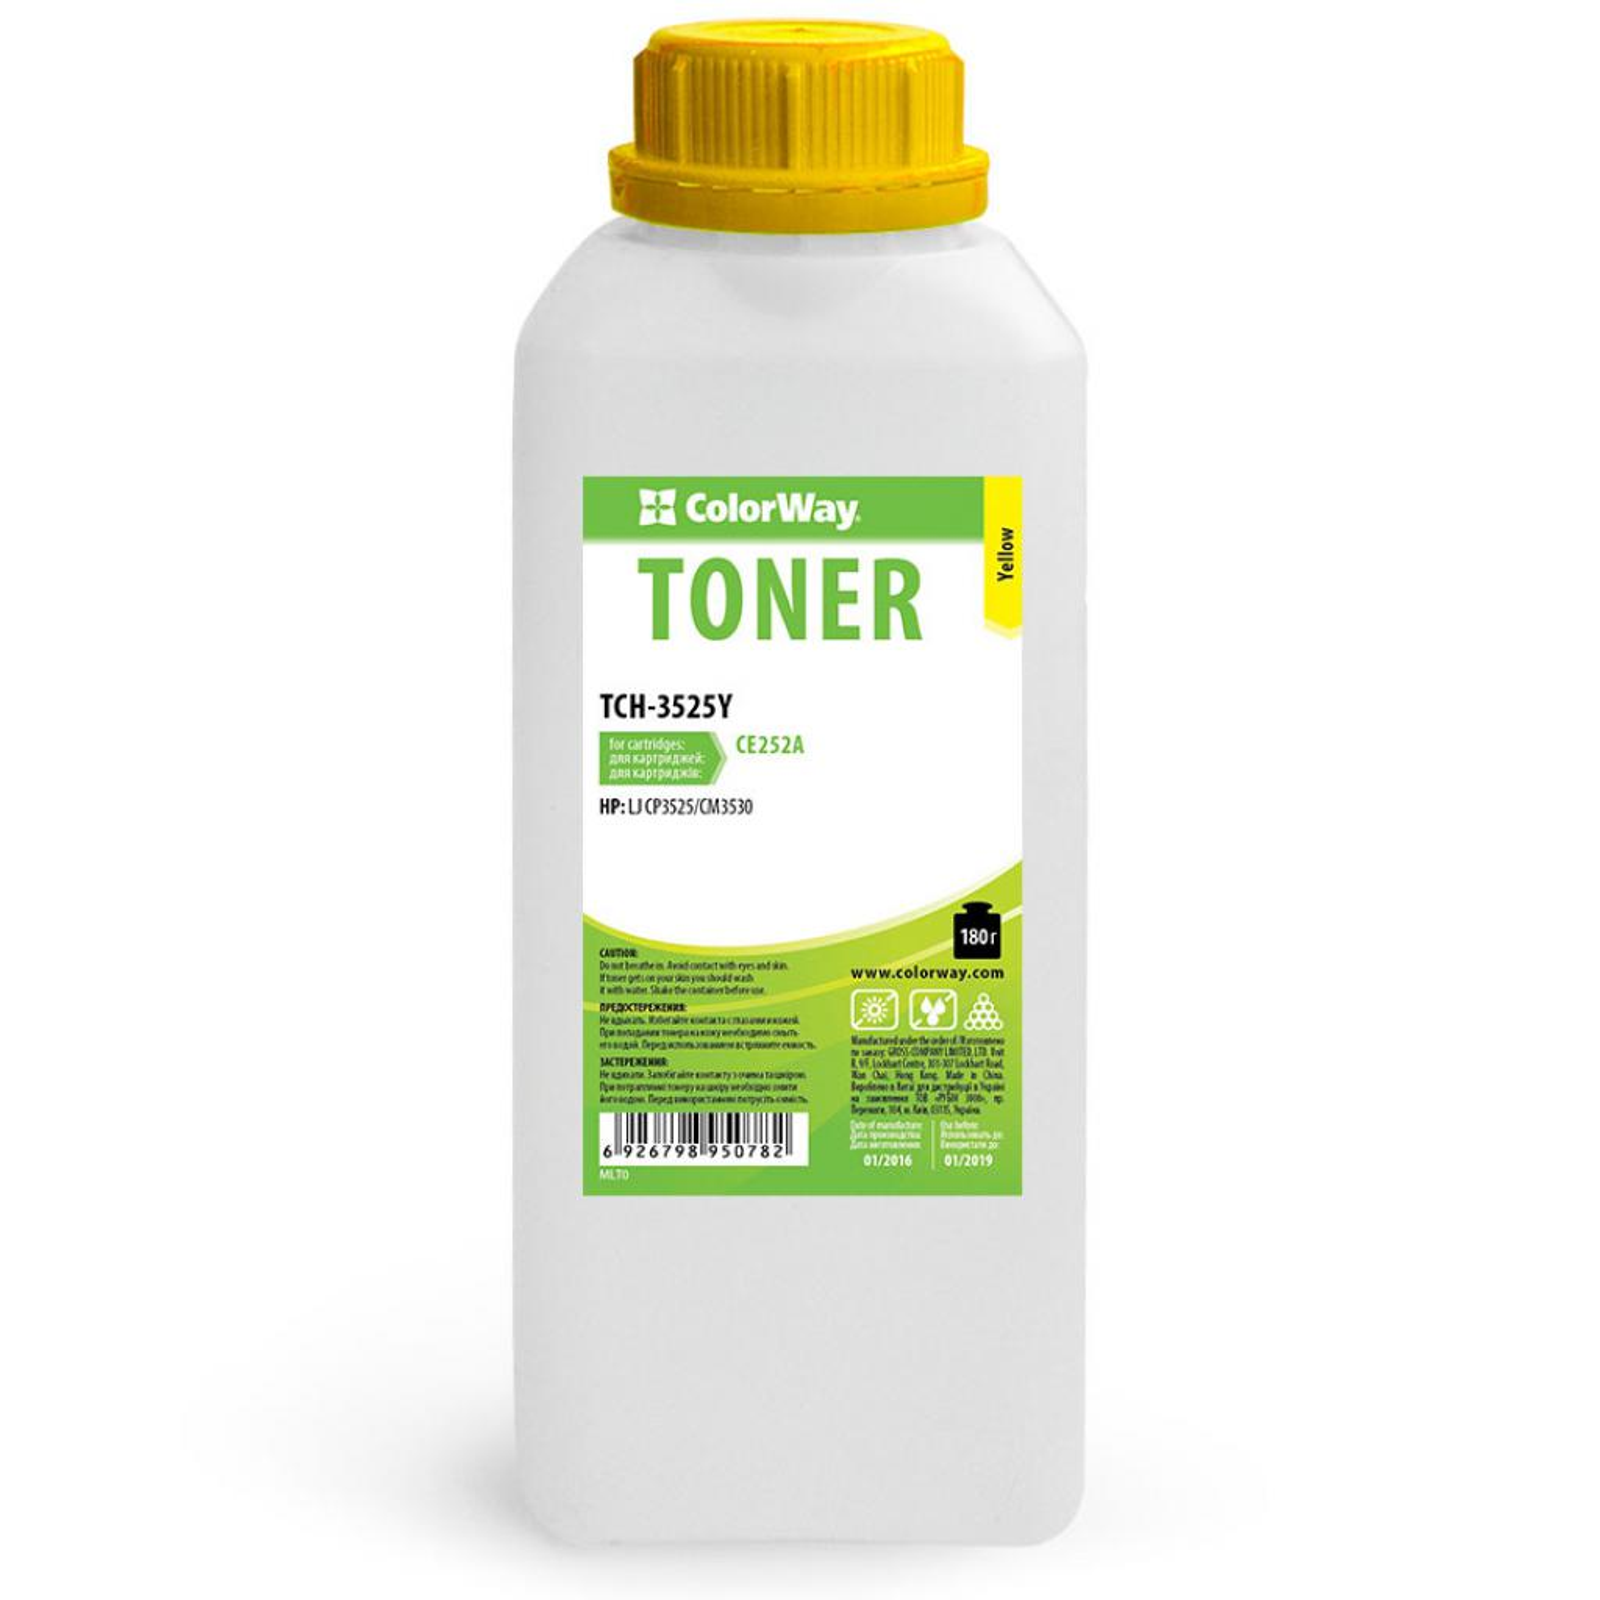 Тонер HP CLJ CP3525 180g Yellow ColorWay (TCH-3525Y)